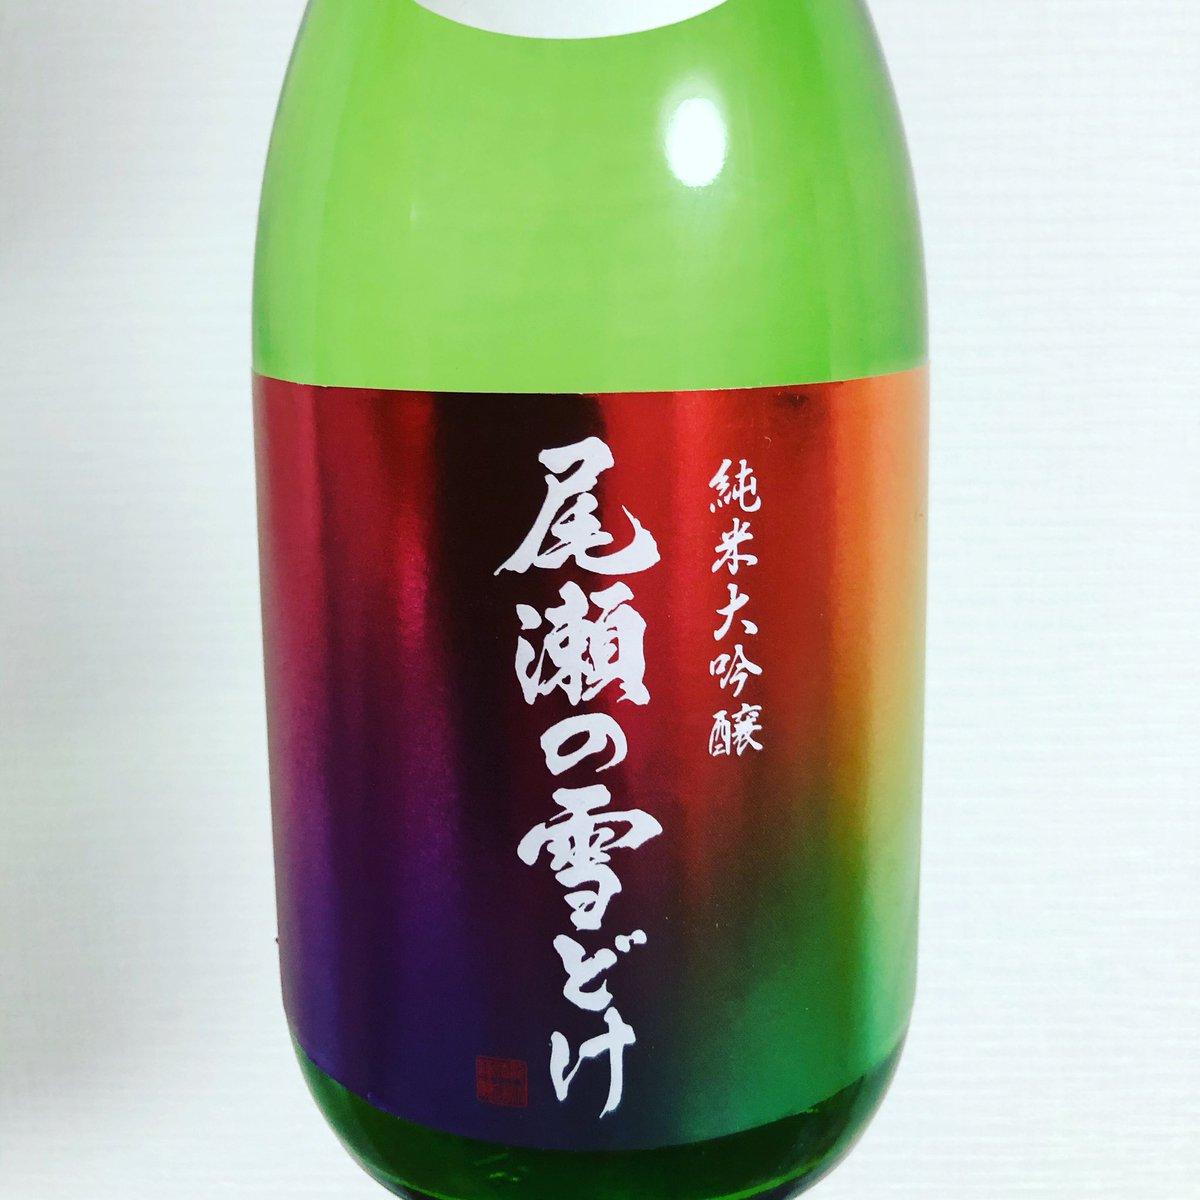 test ツイッターメディア - 日本酒全国制覇29県目  群馬県 龍神酒造 尾瀬の雪どけ 純米大吟醸  これまた非常に好みのフルーティー日本酒でした。 https://t.co/G9YaTmSMBC